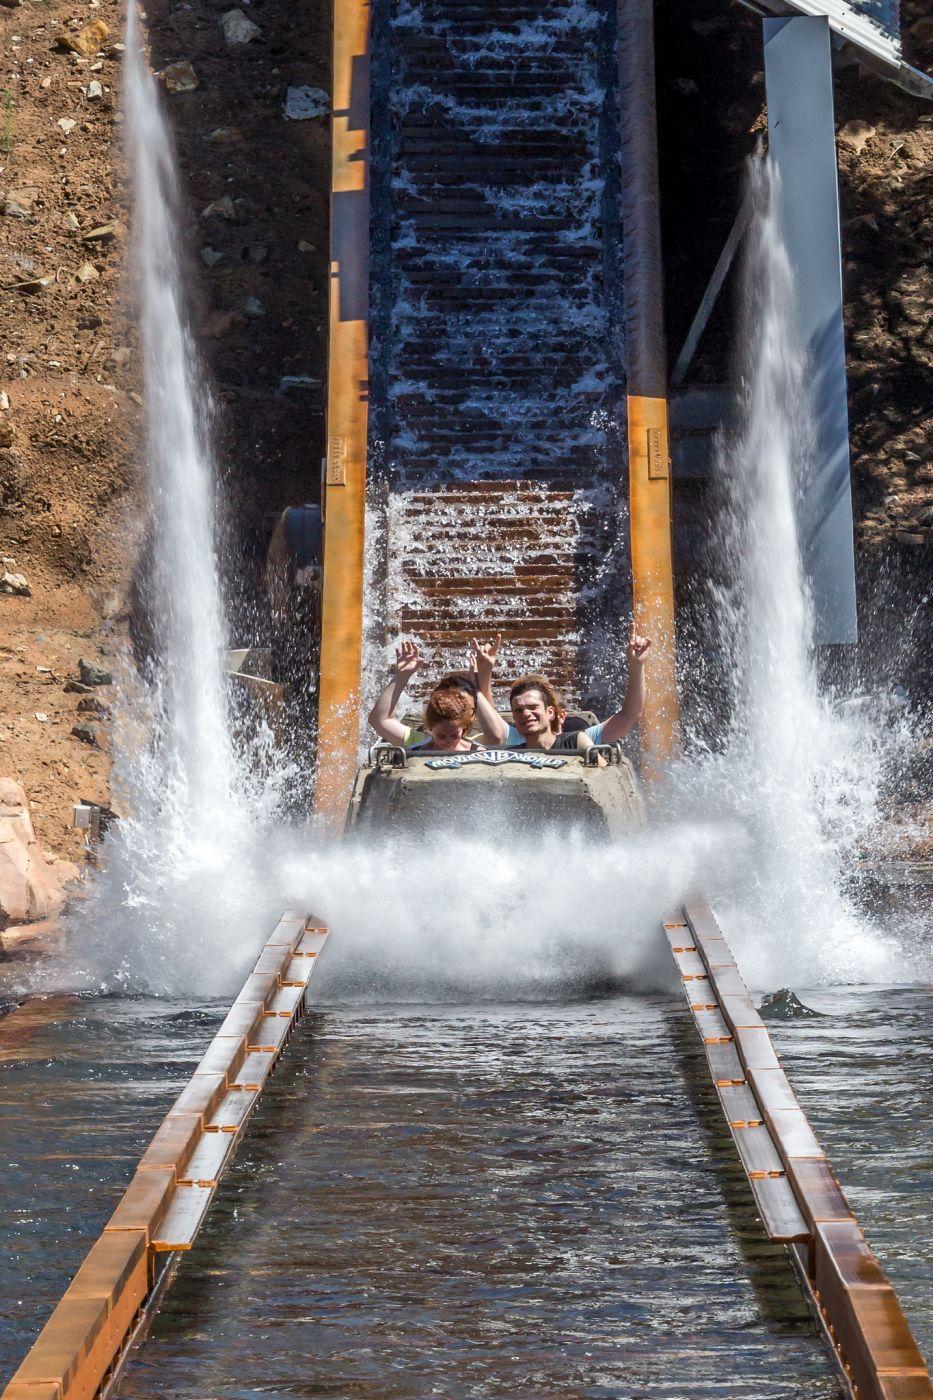 Wild West Falls at Warner Brothers Movie World, Australia